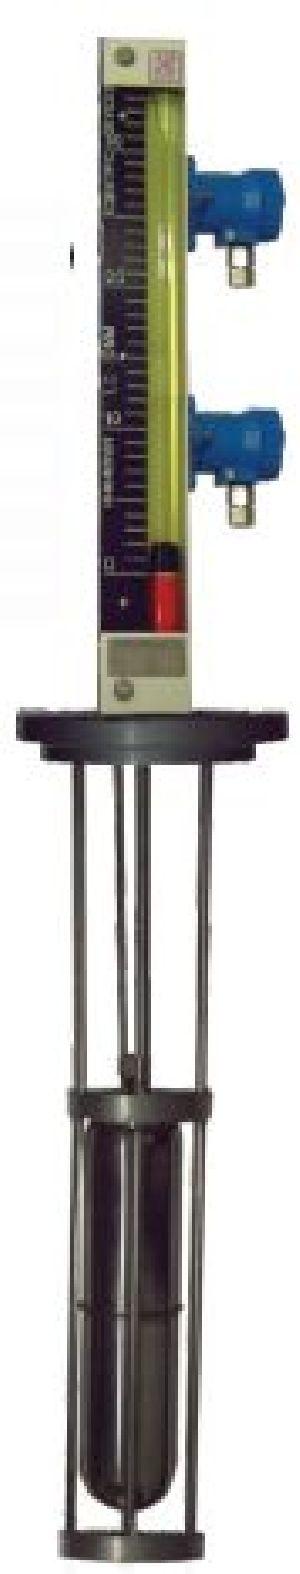 MLITI1100-LSL Top Mounted Magnetic level Indicator